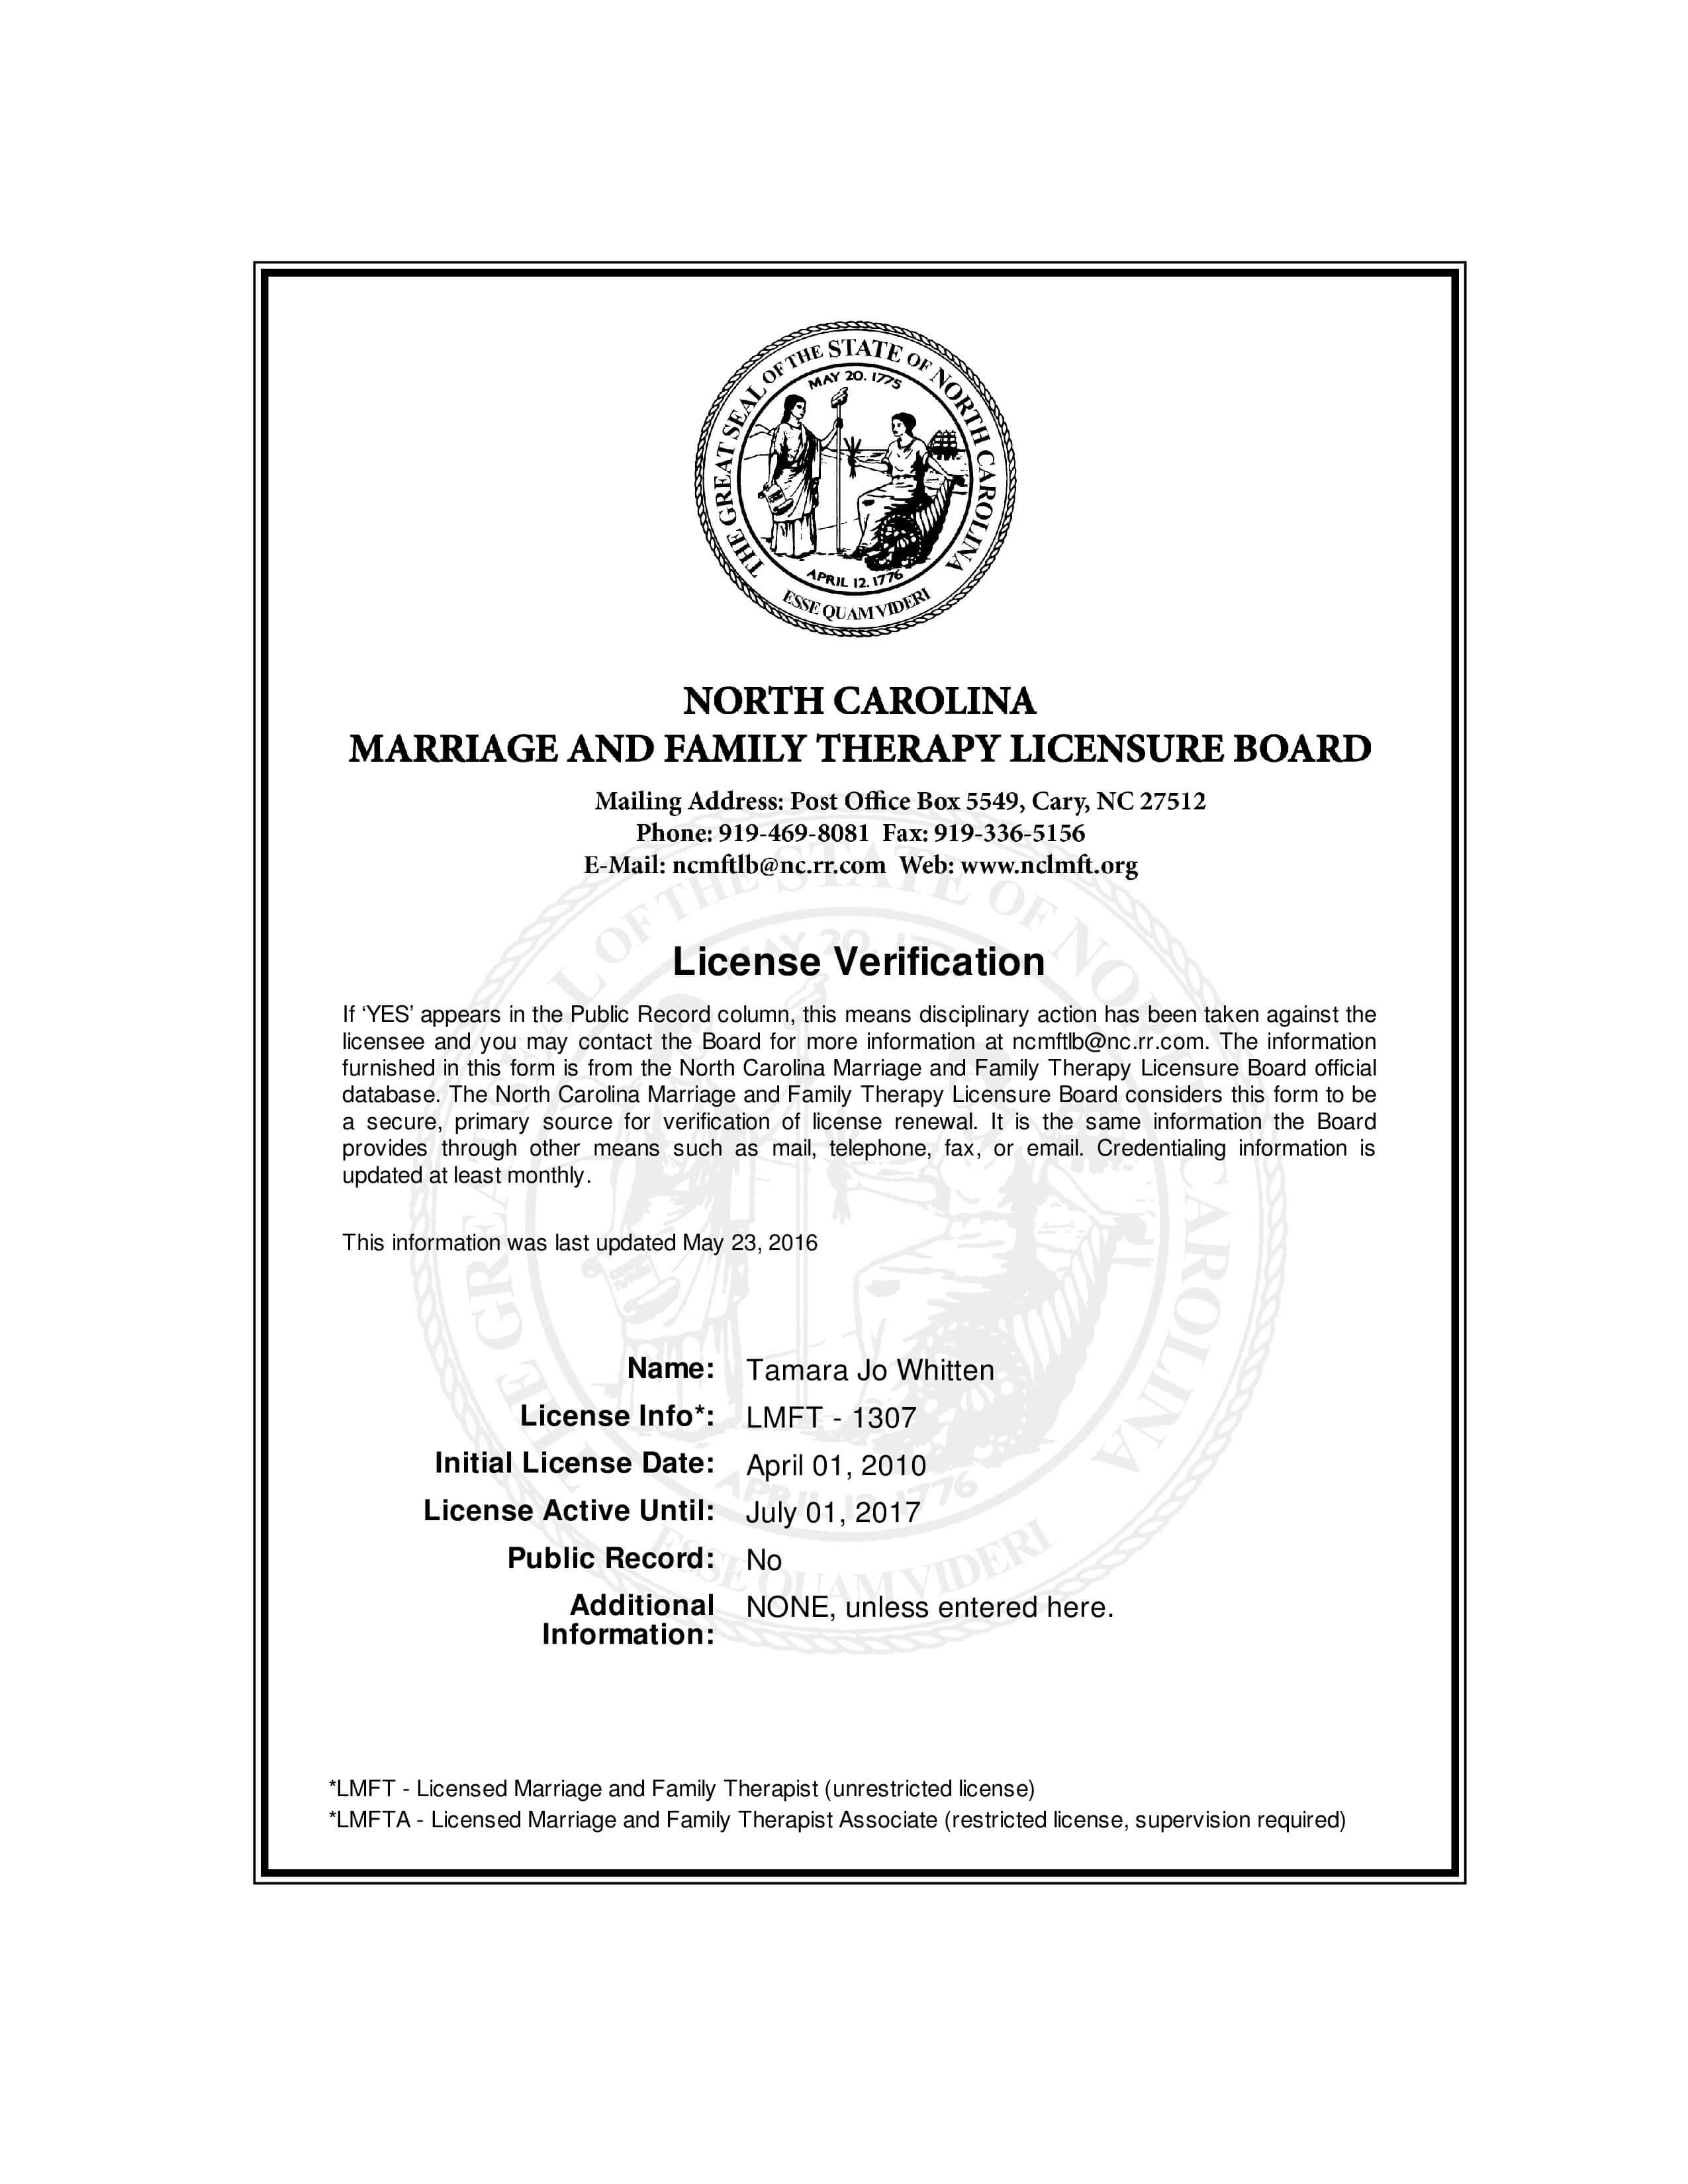 Tammy Whitten LMFT License 2016-2017